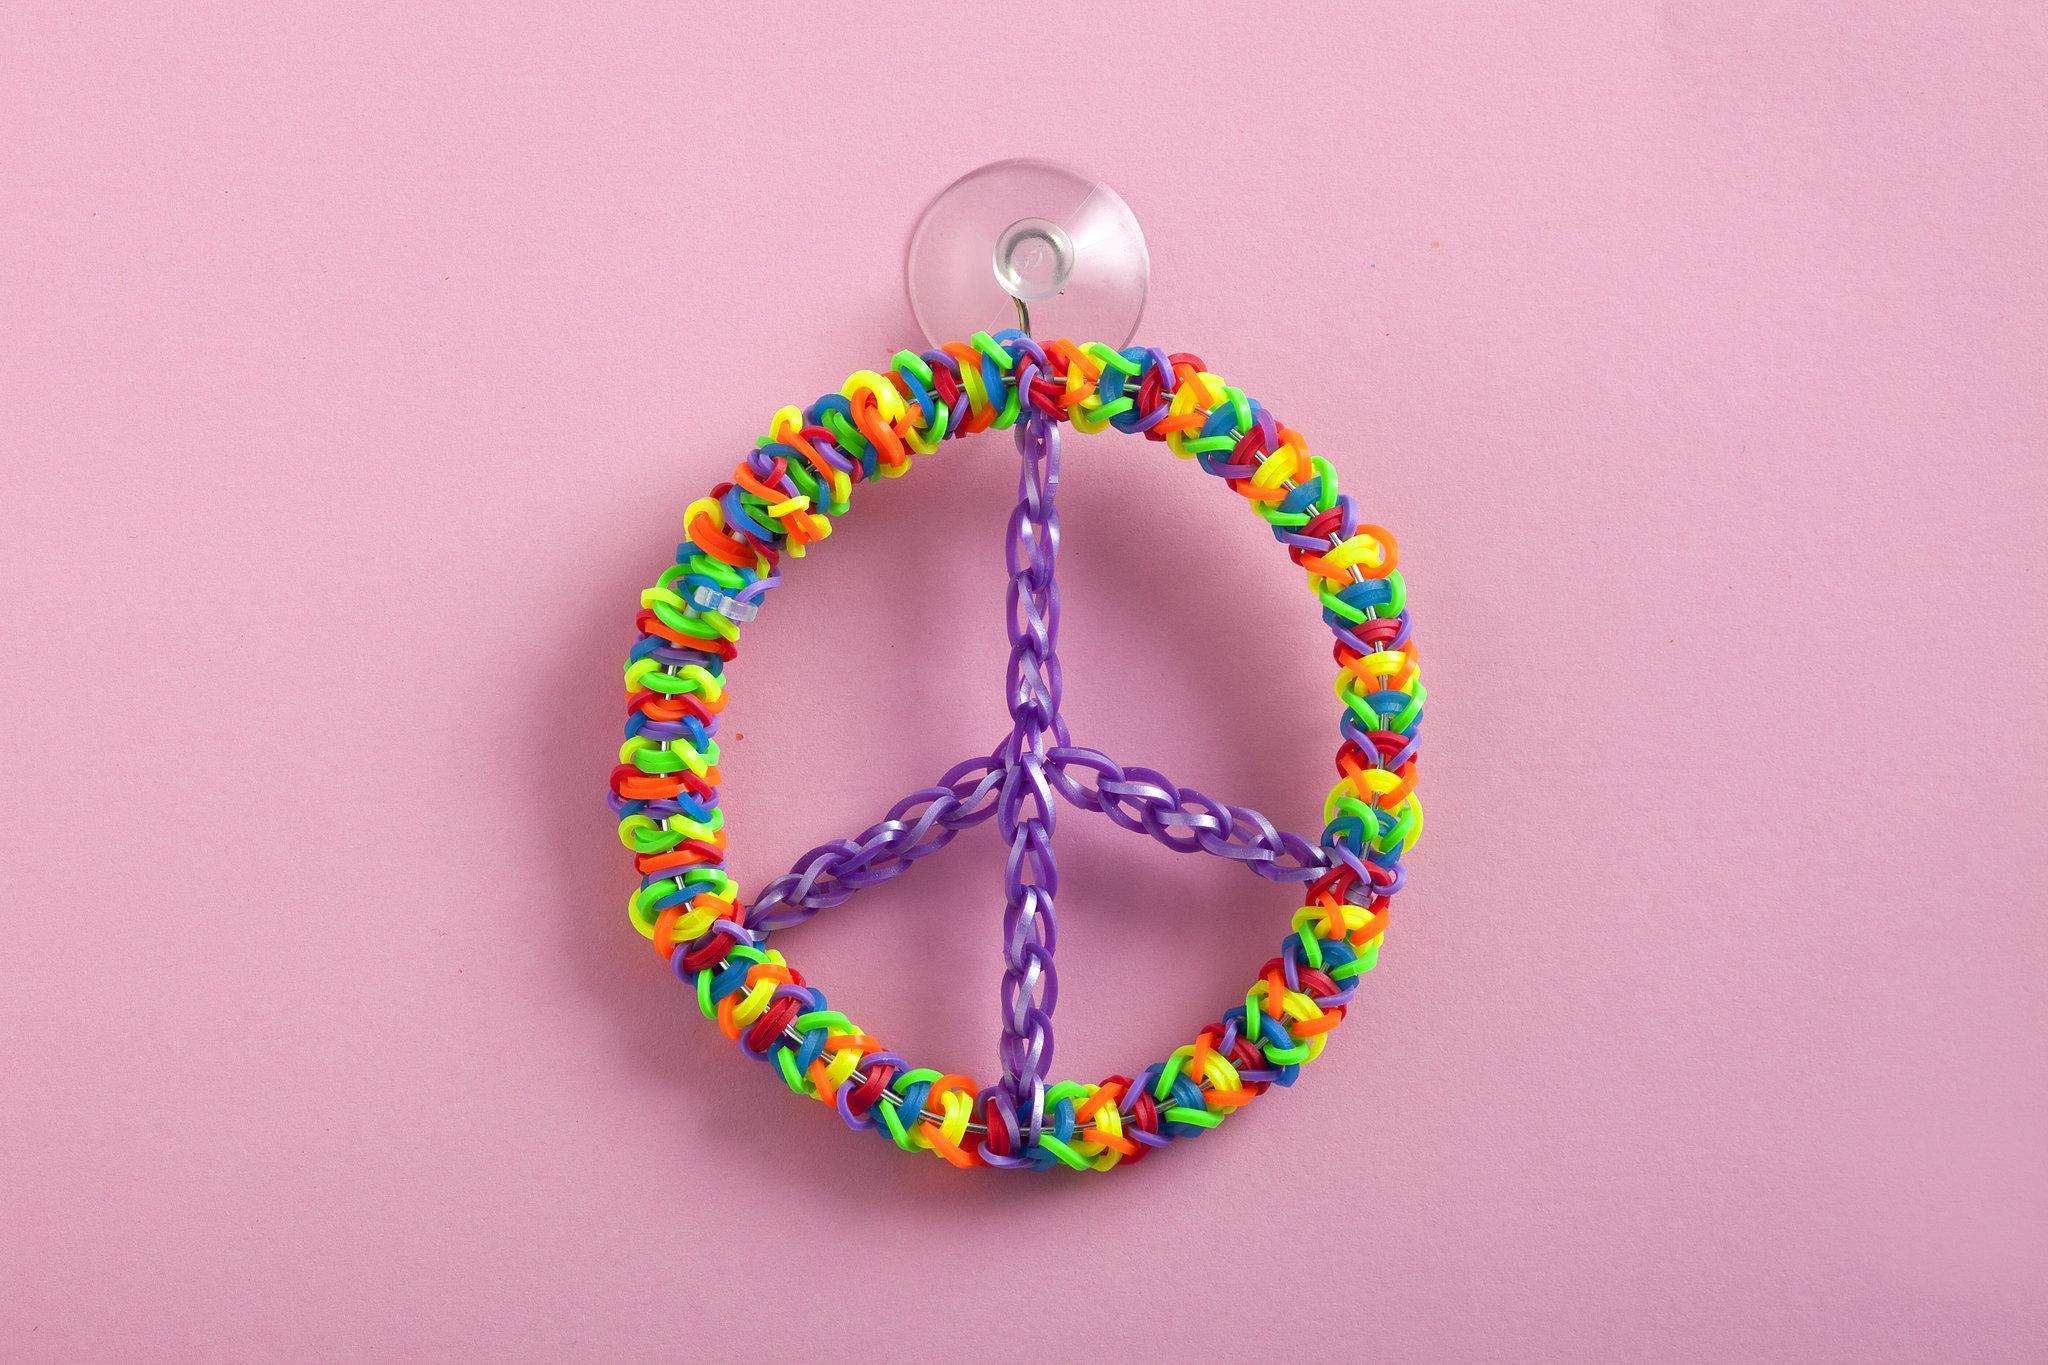 loop and loom bracelet instructions